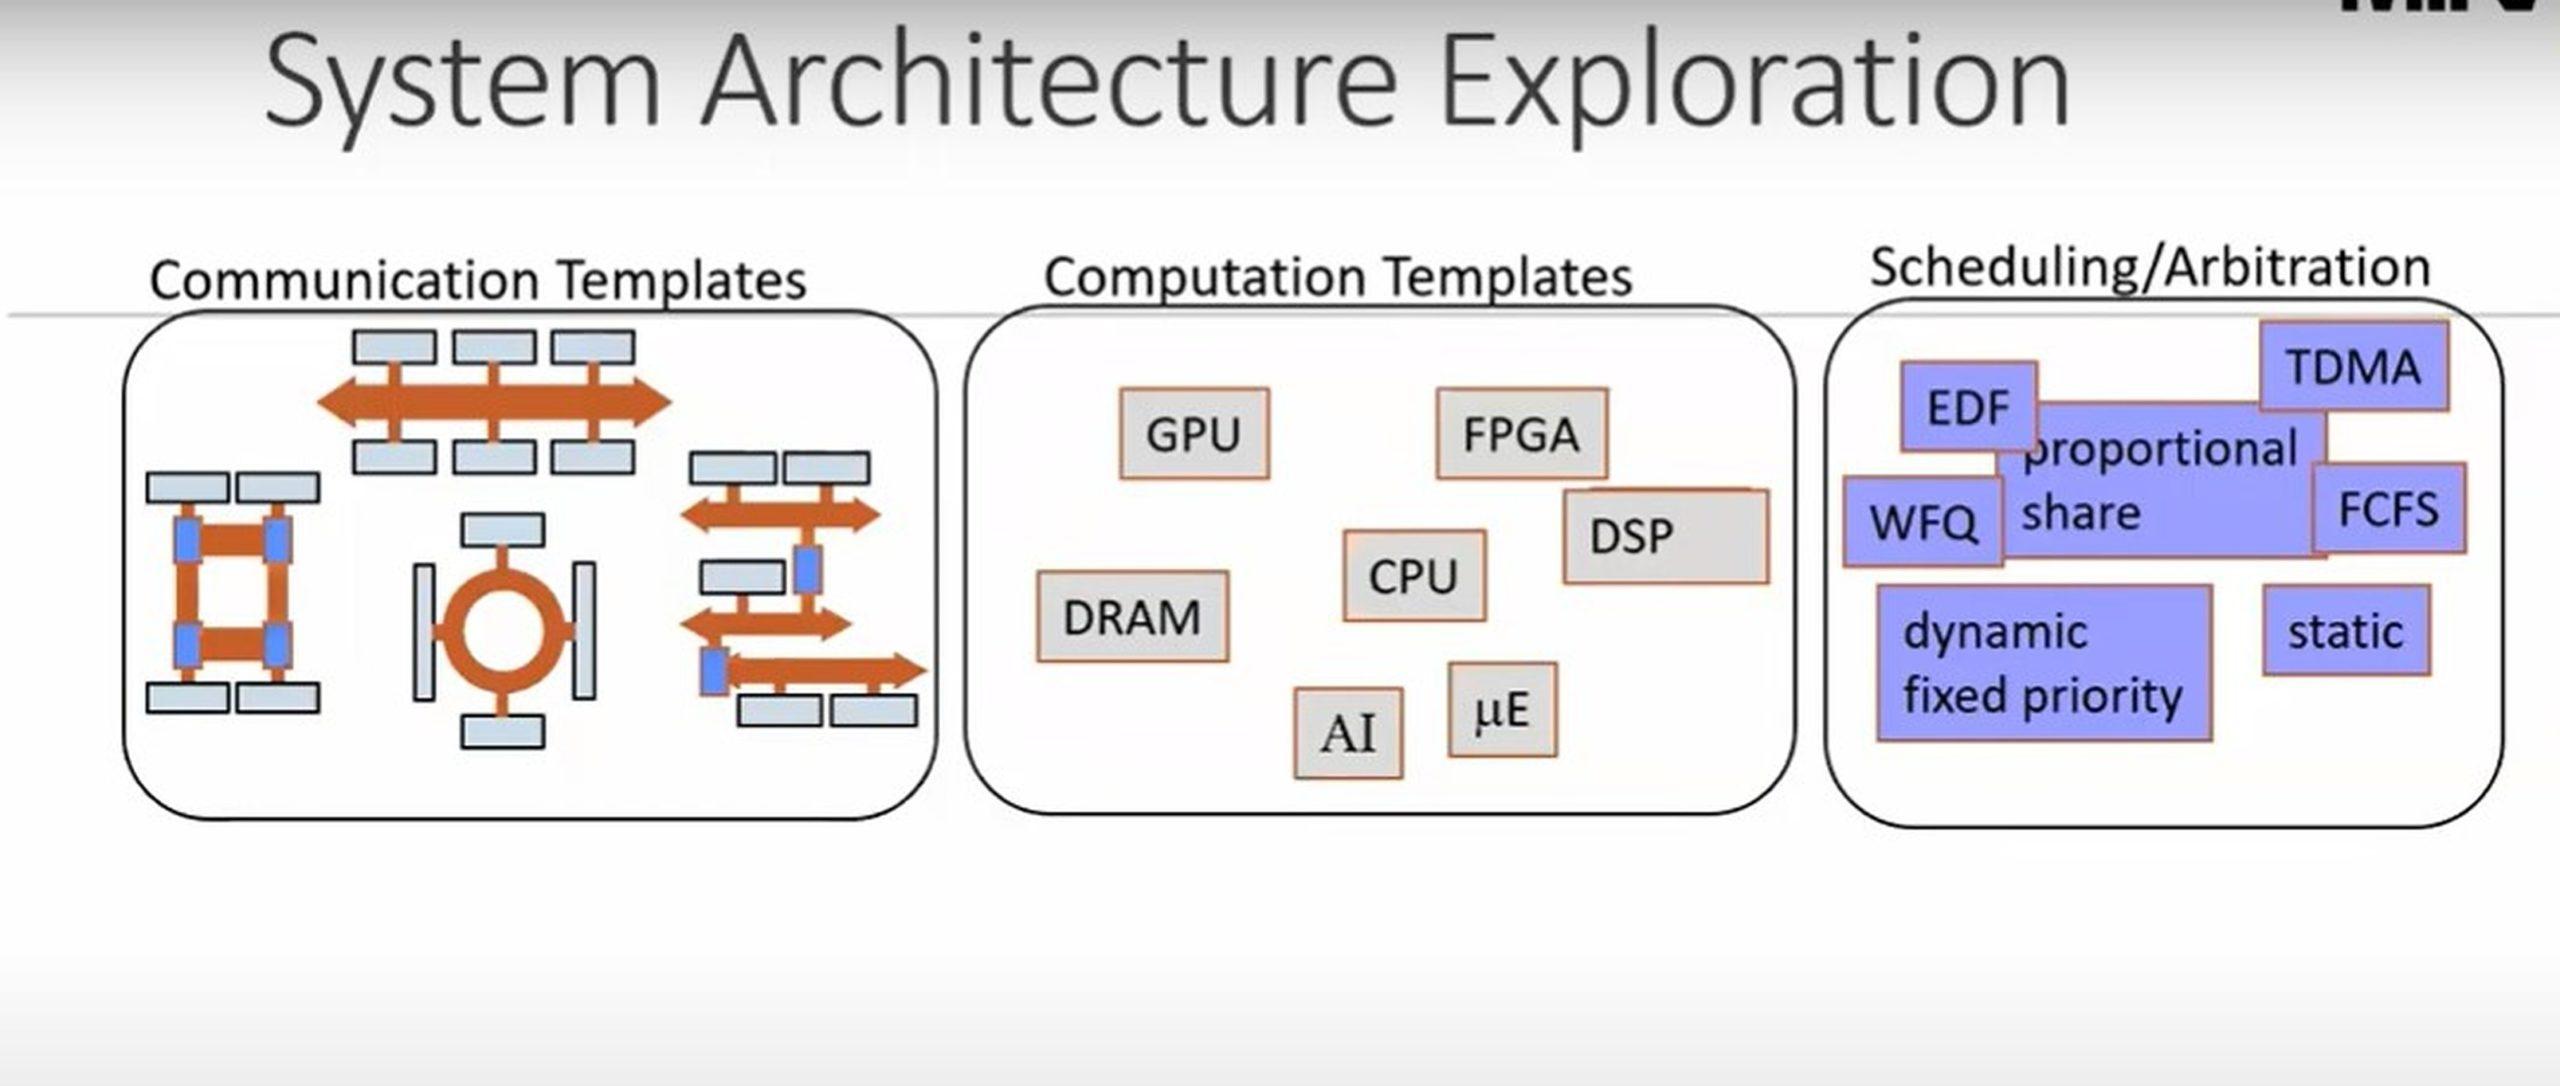 AE2 architecture